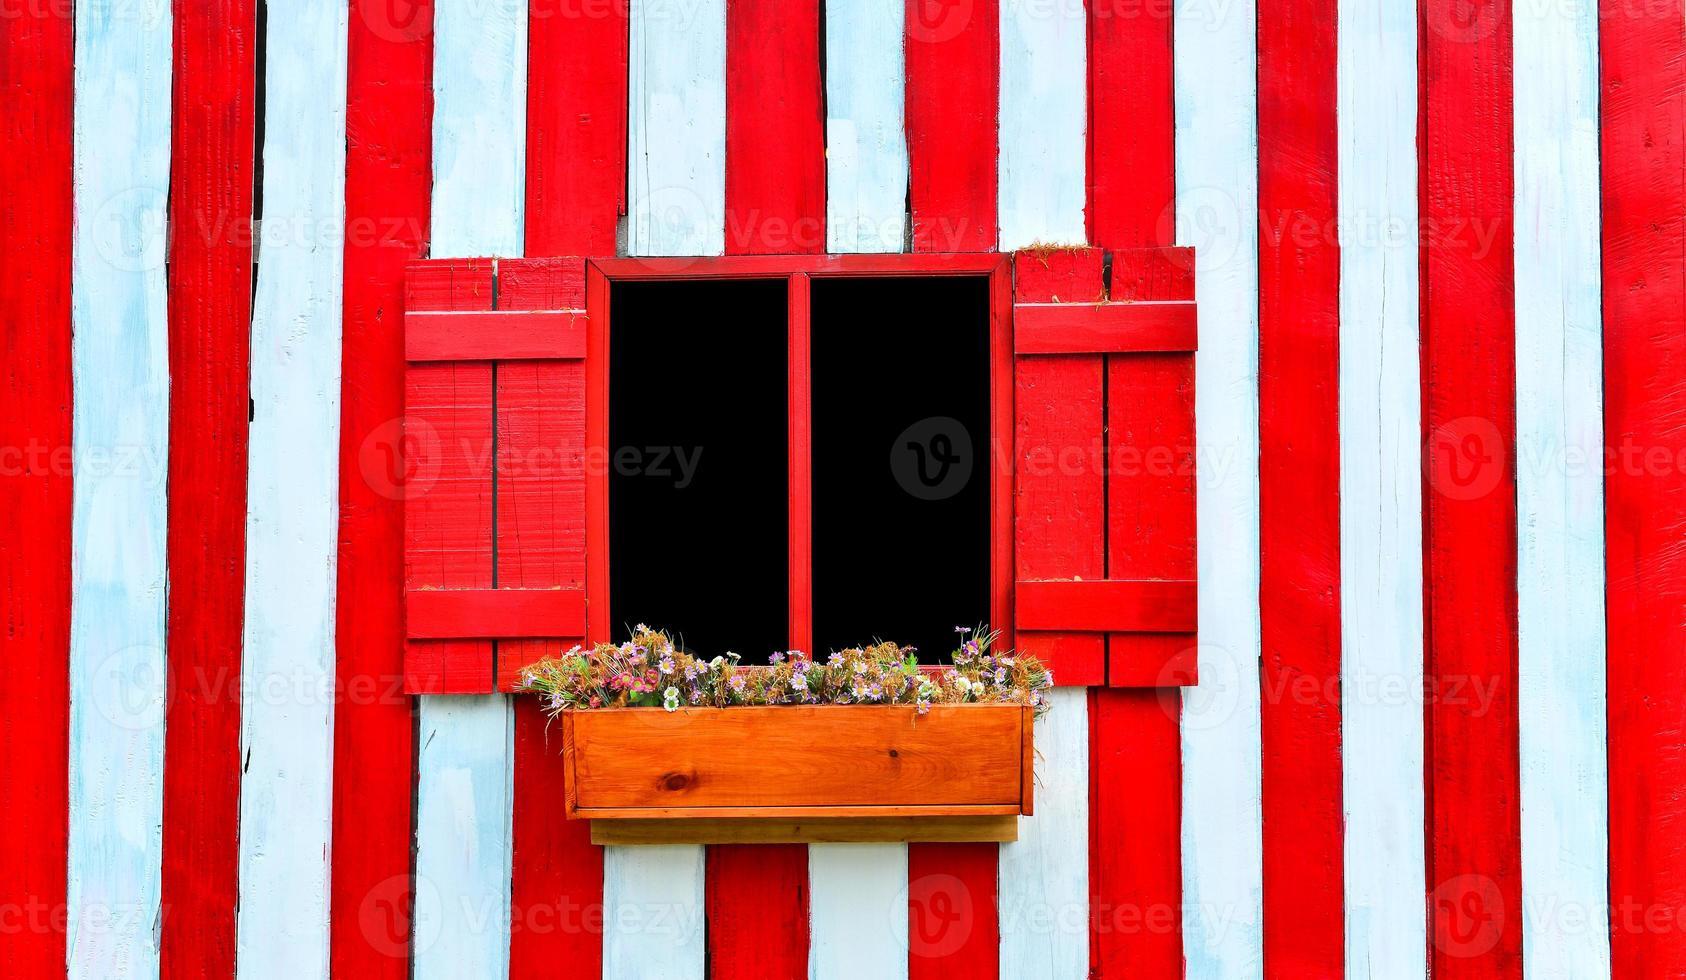 rood venster op rode en witte houten muur foto